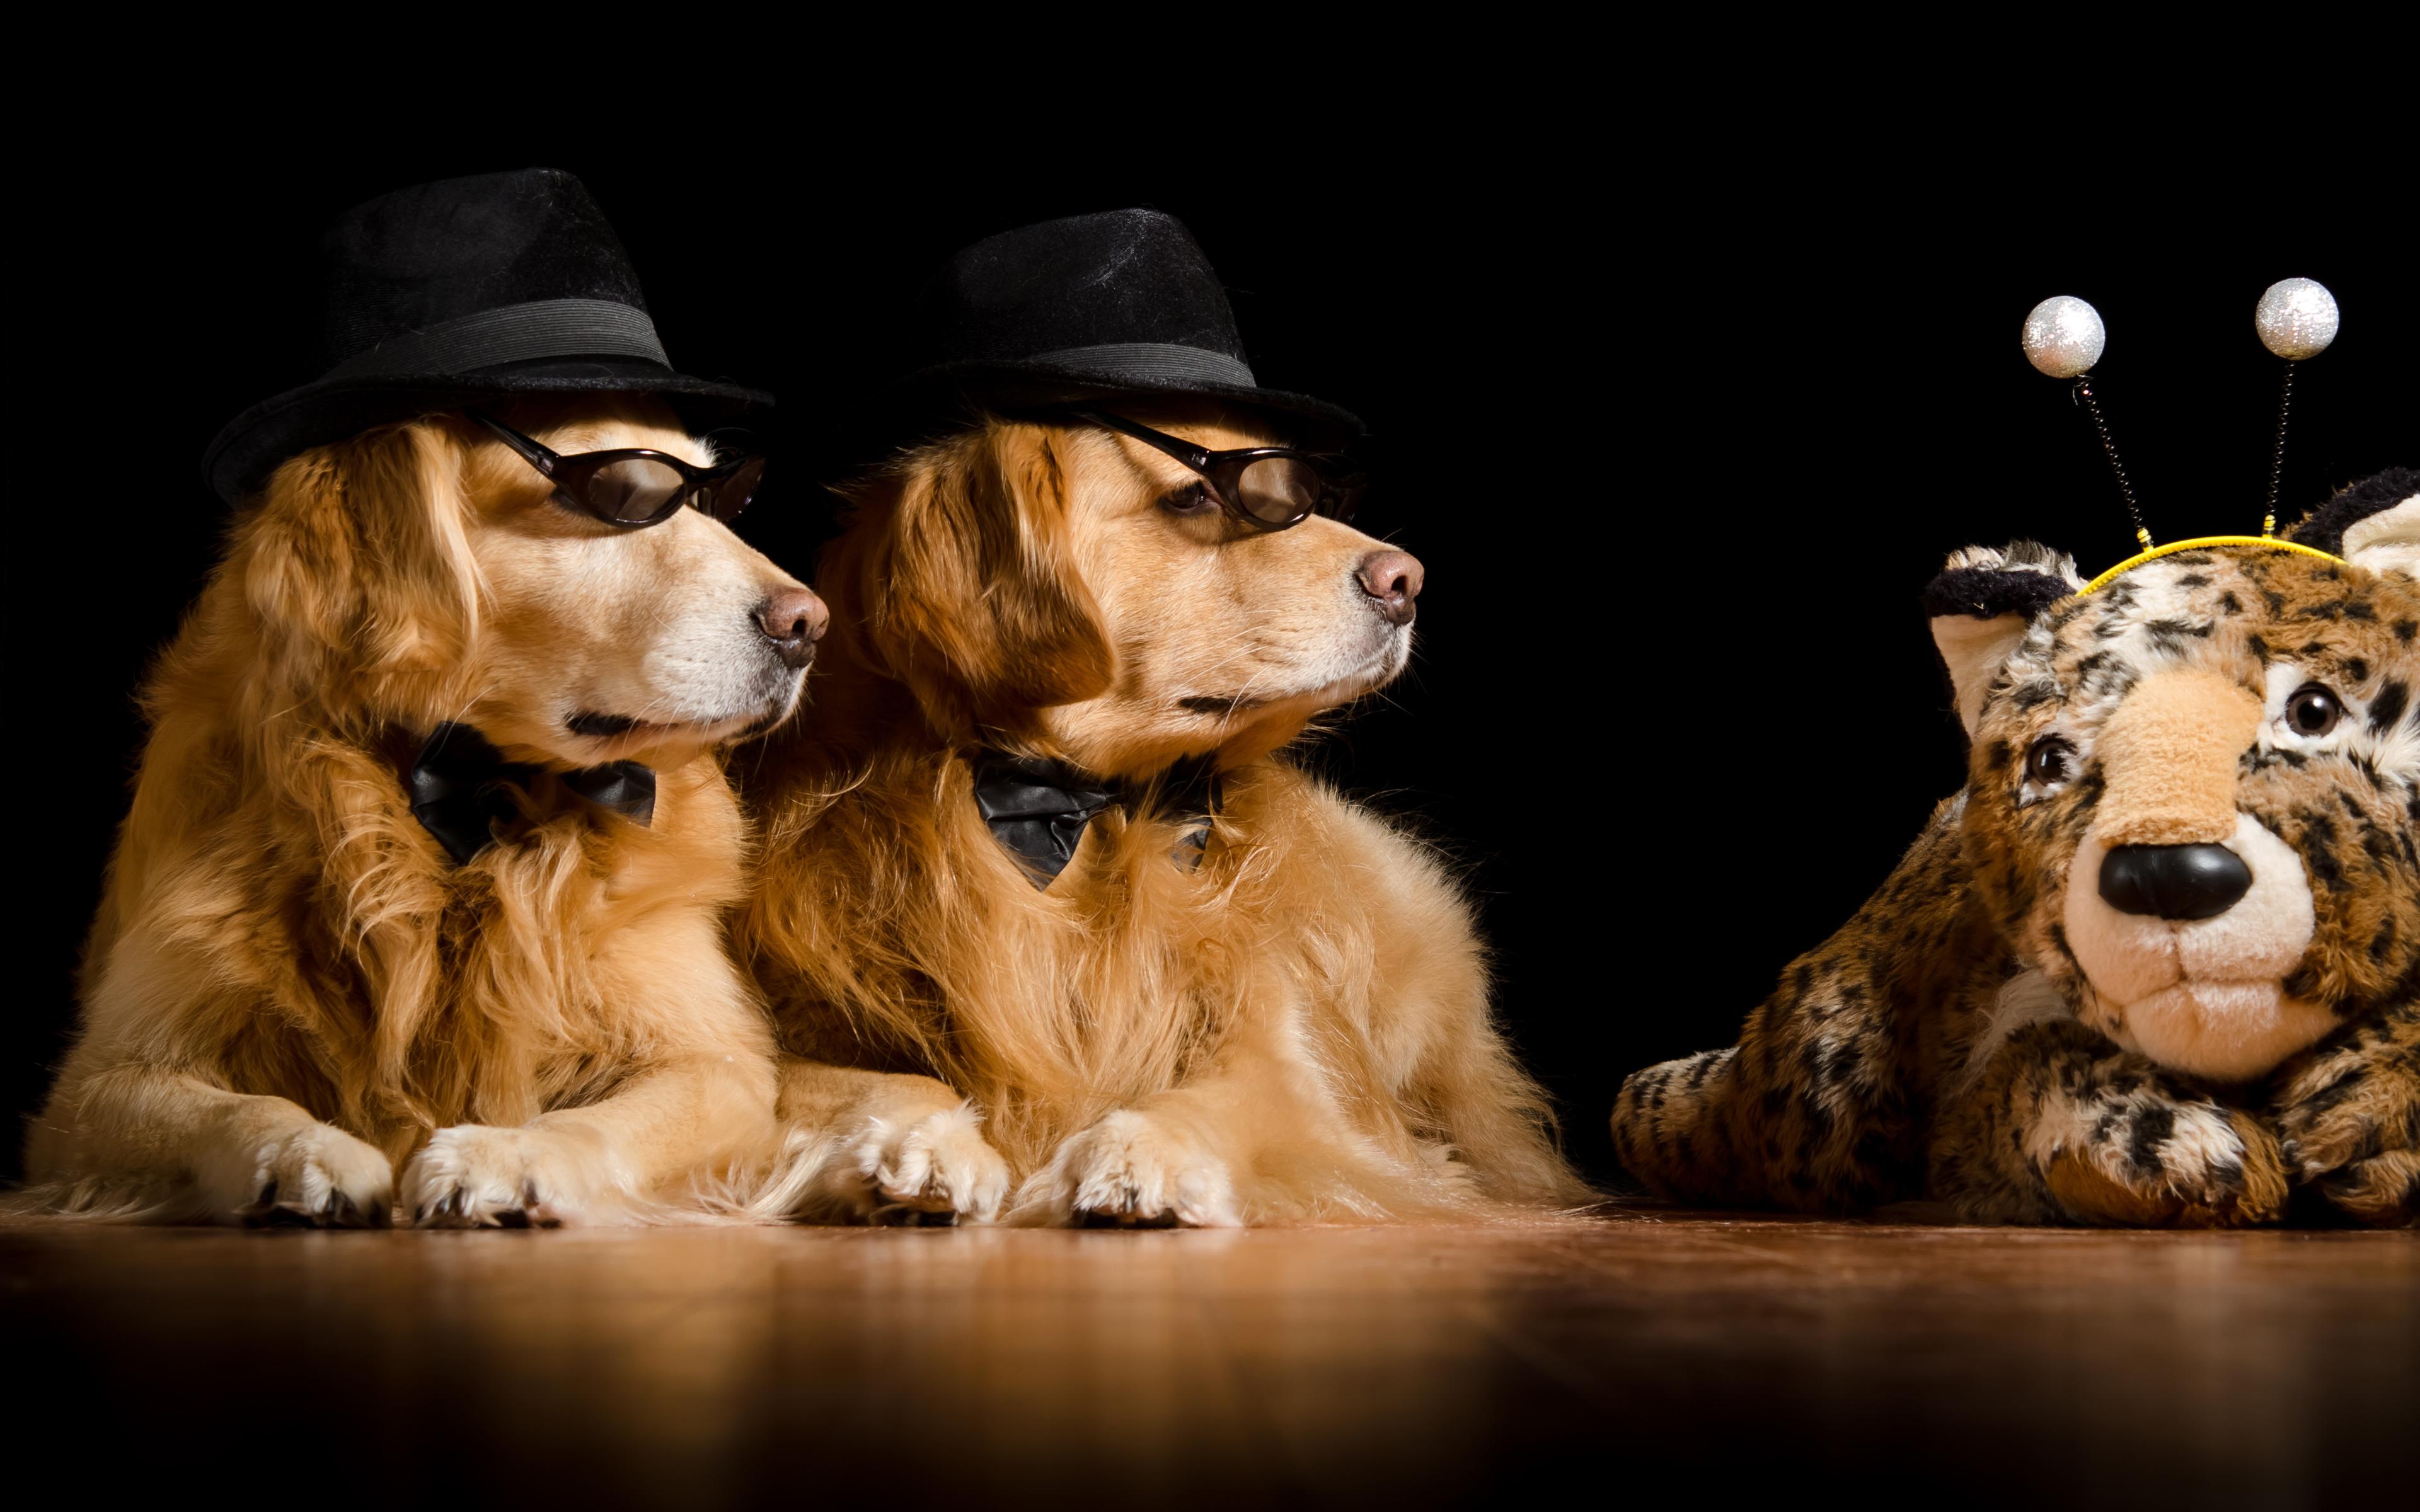 Певец собака юмор очки  № 1527434 без смс